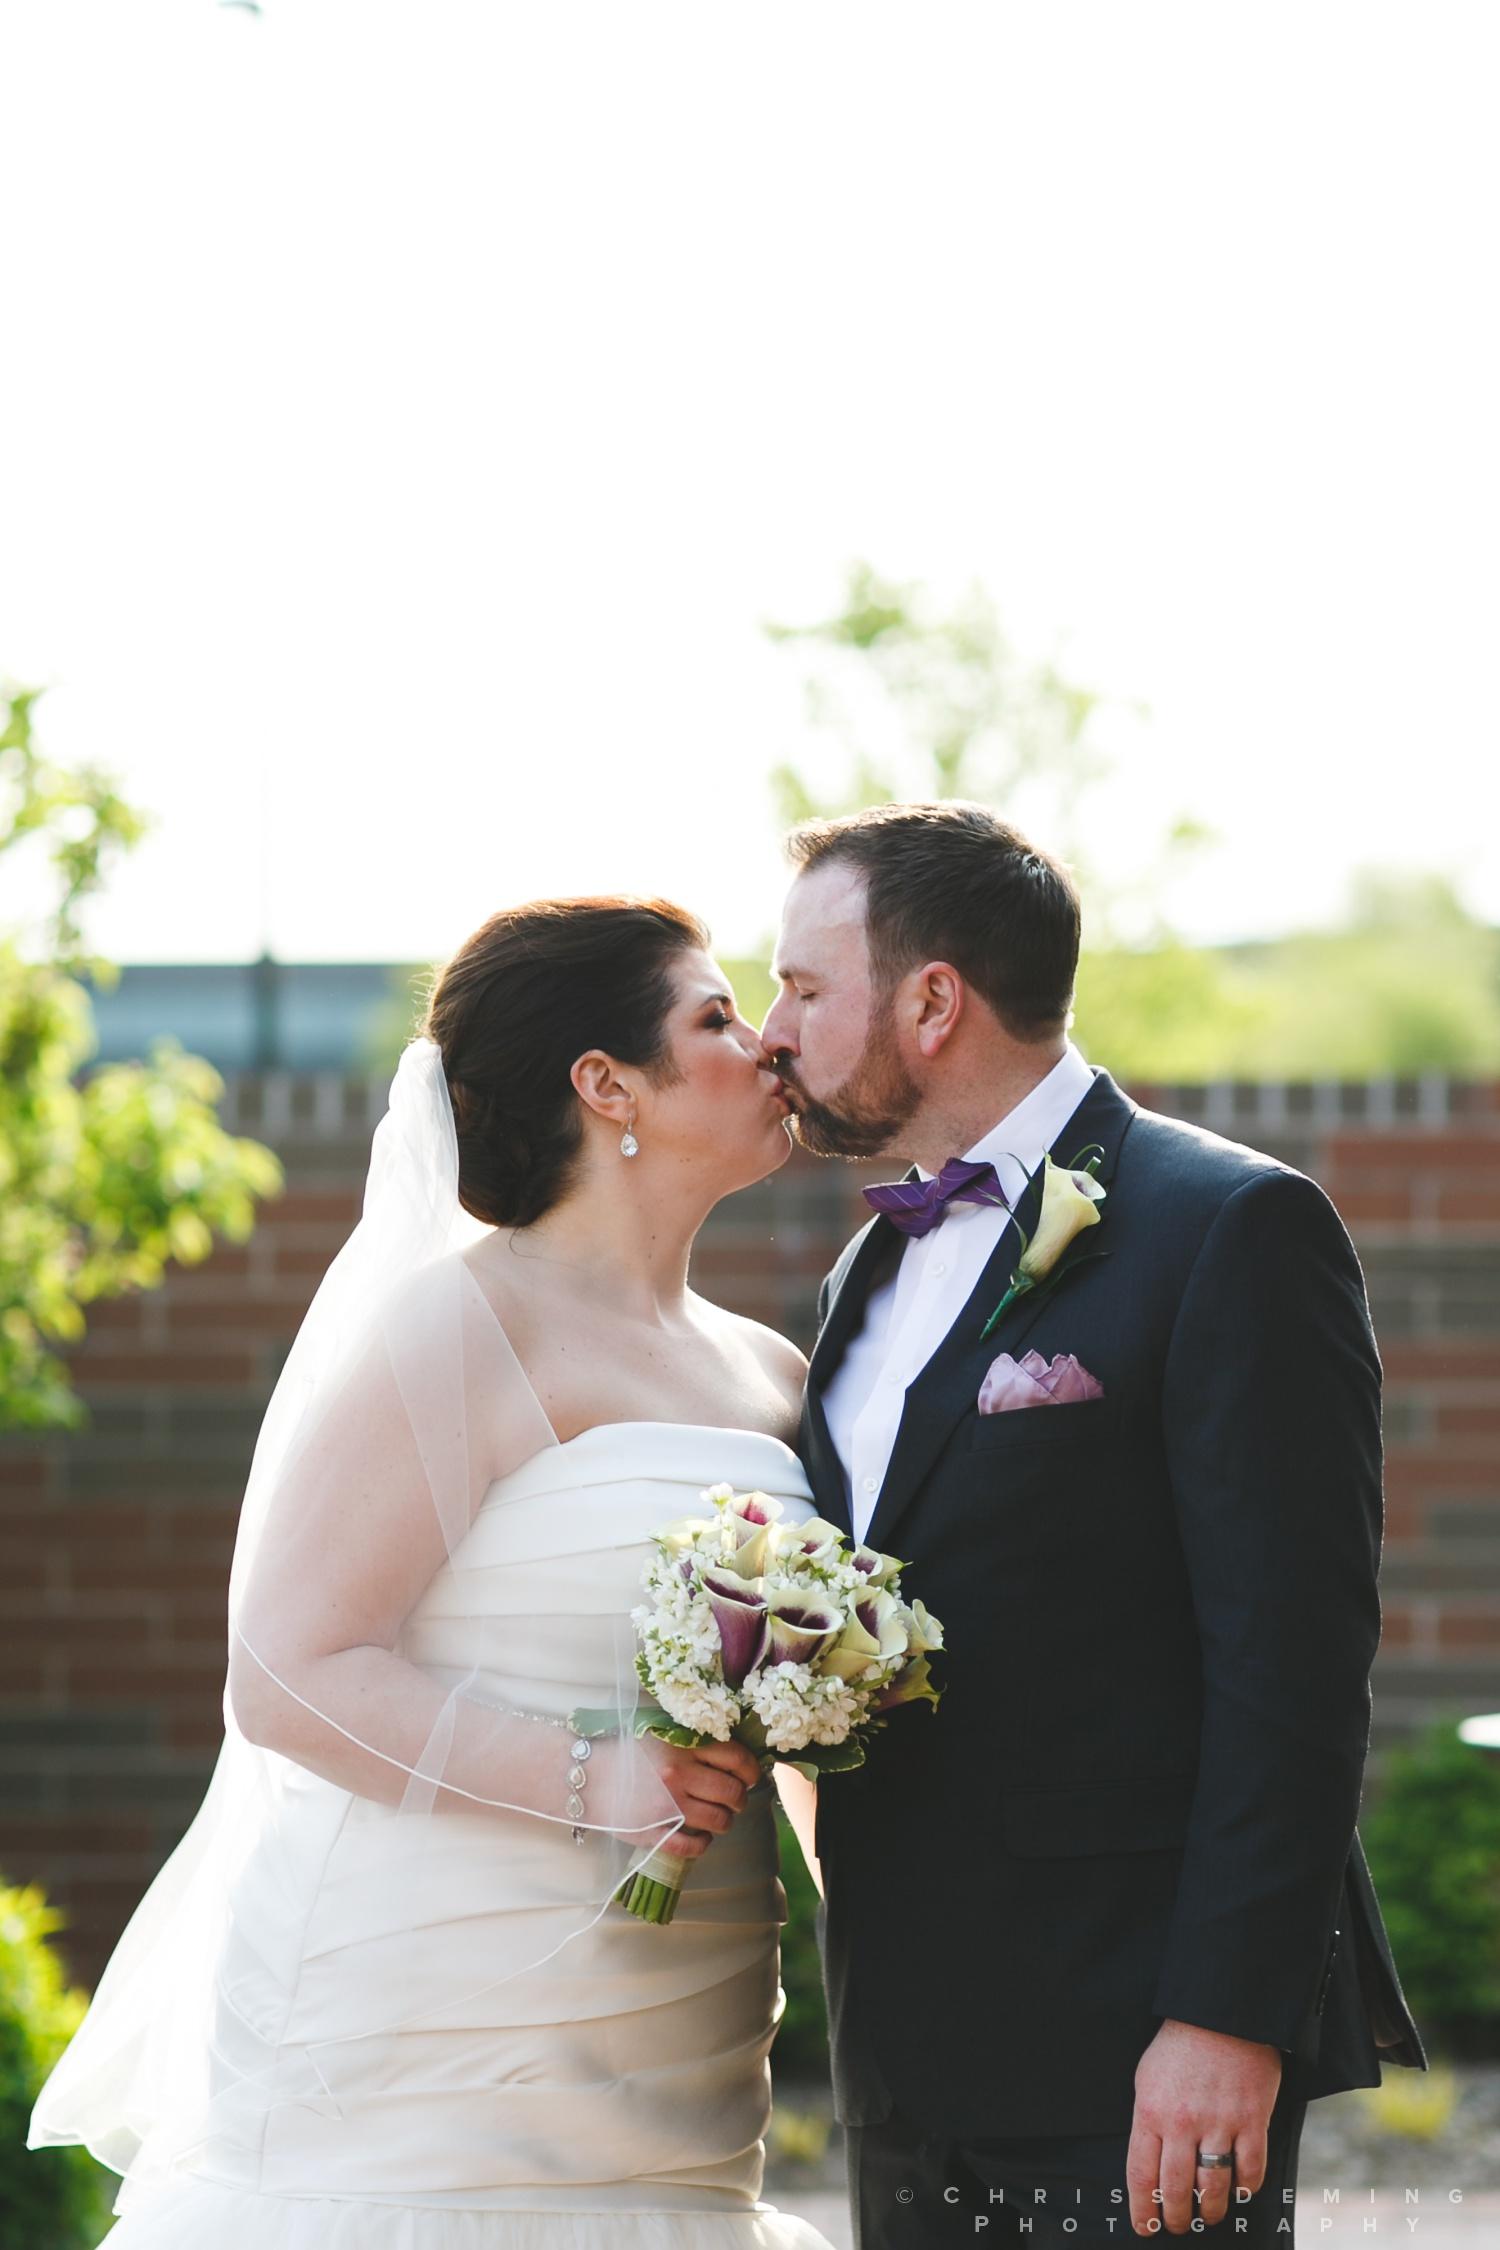 naperville wedding photographer_0030.jpg